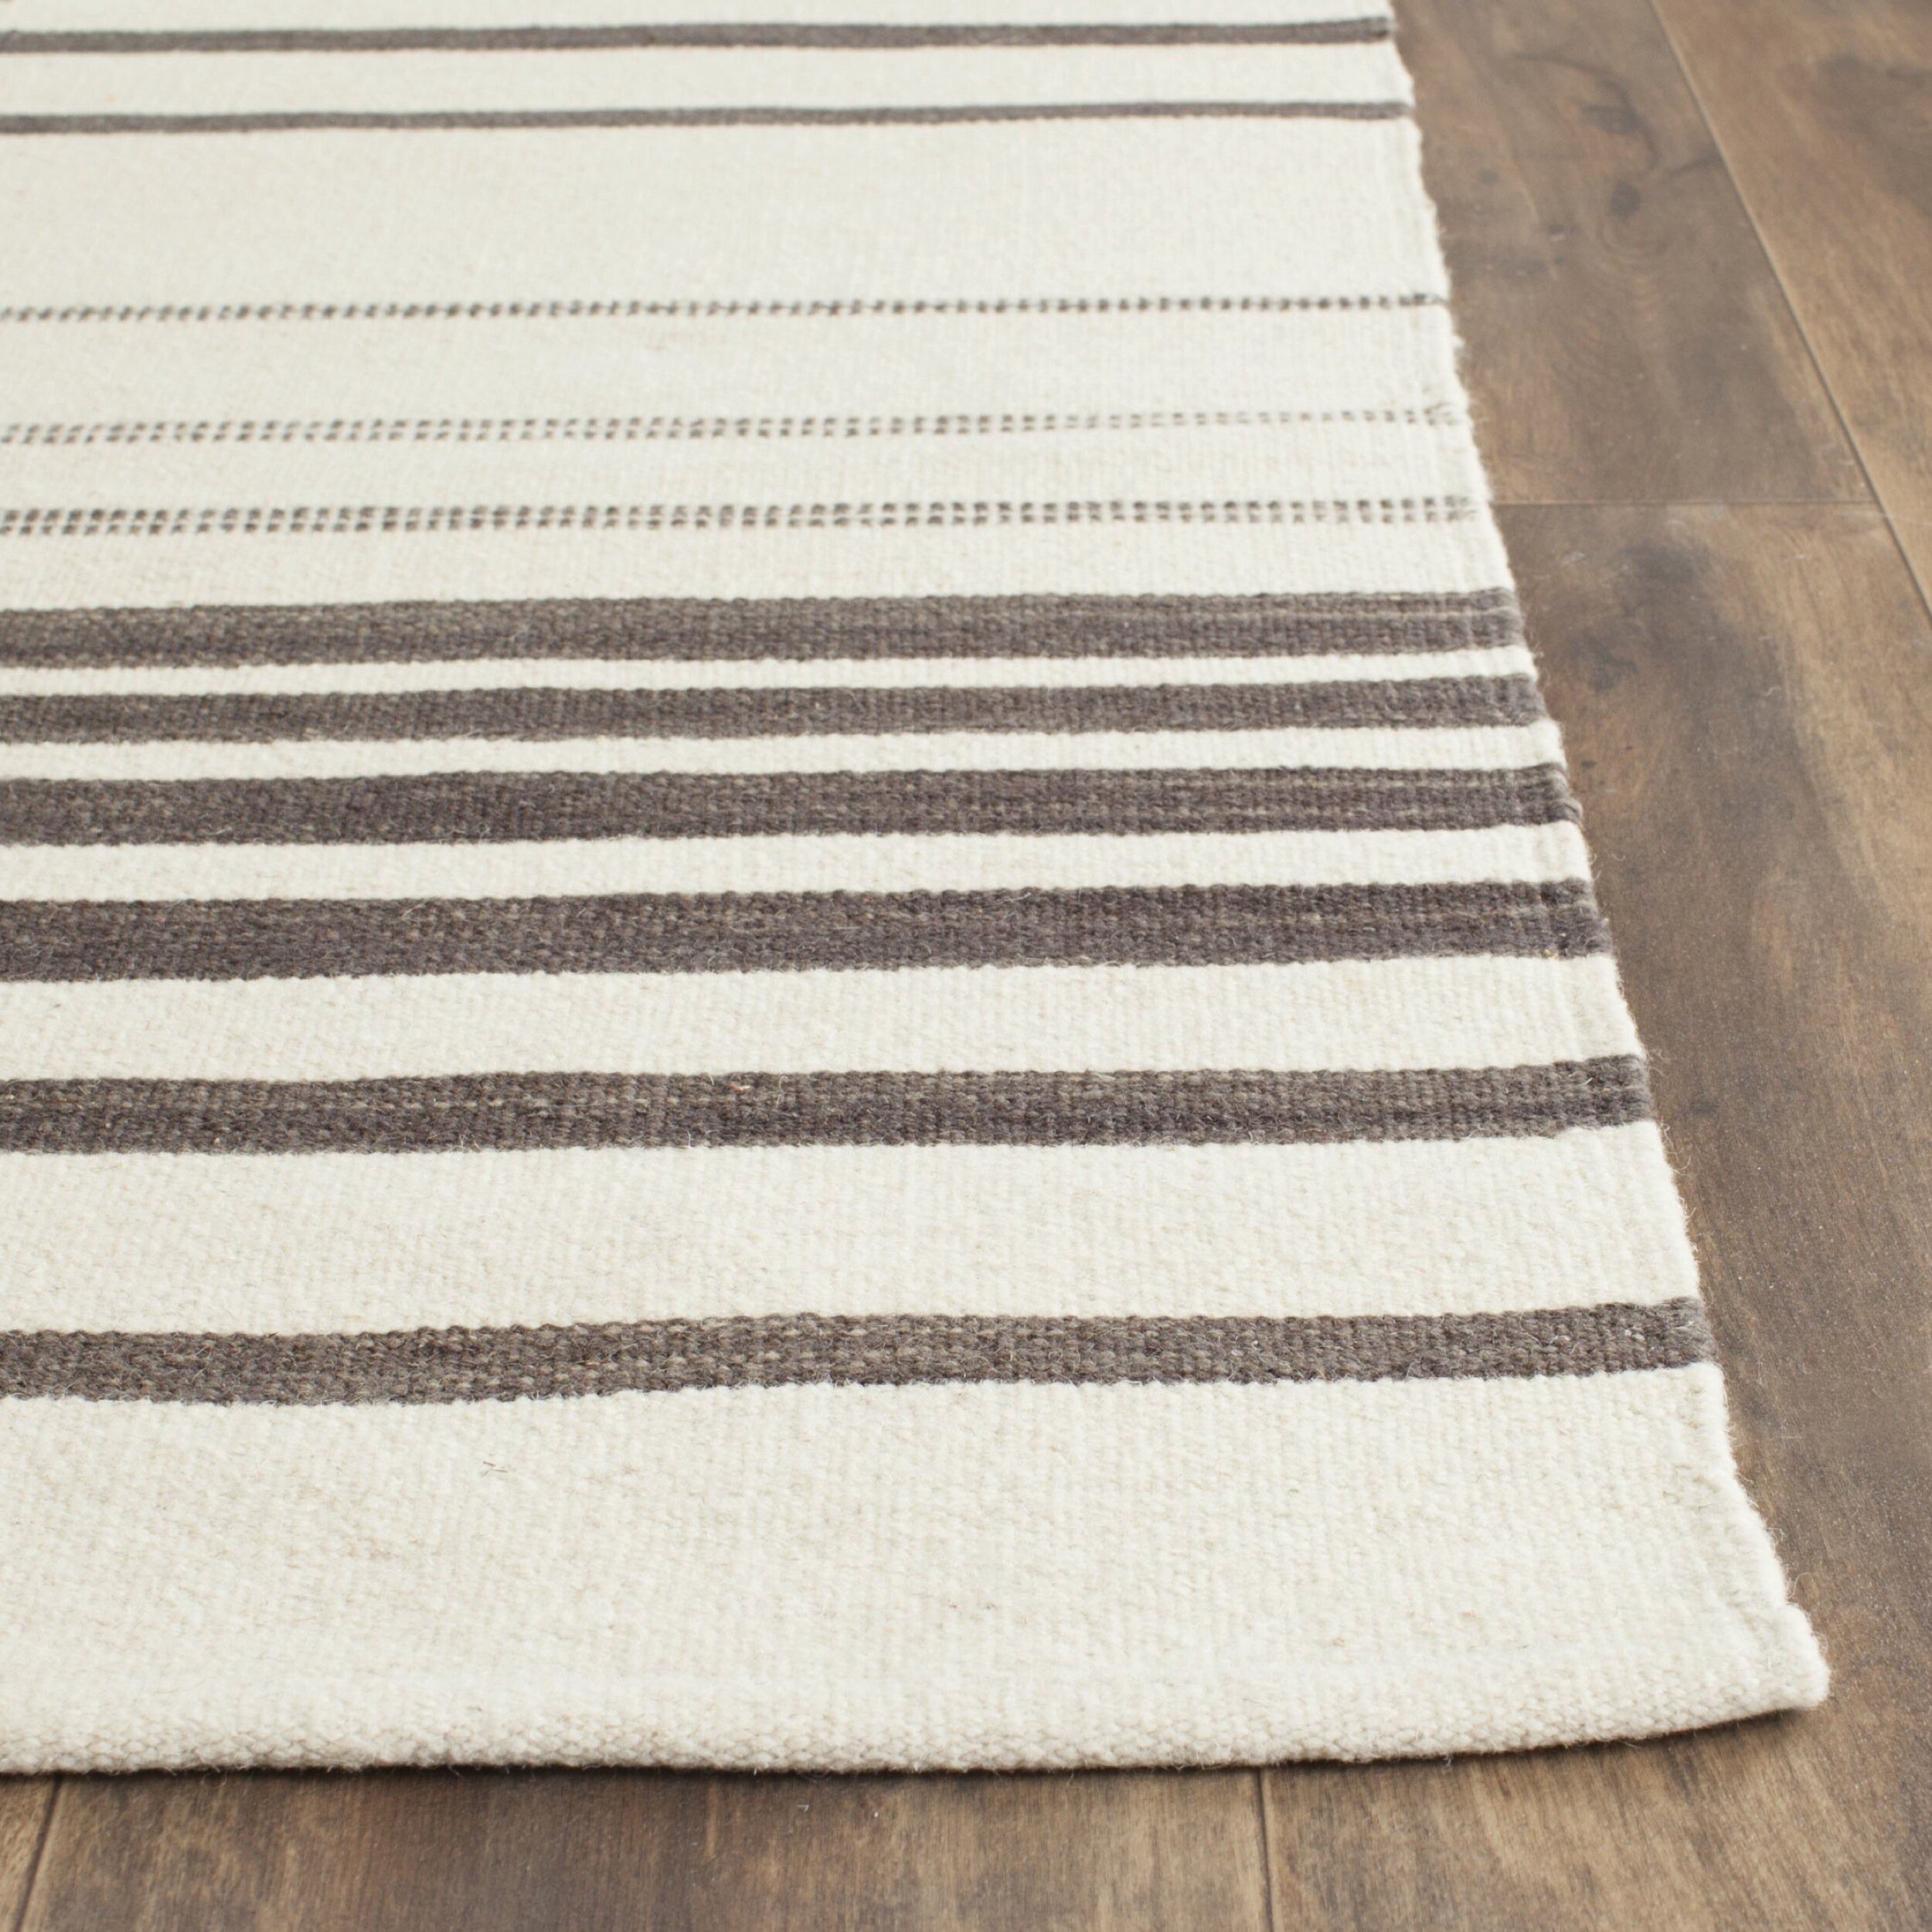 Safavieh Kilim Brown / Ivory Striped Rug